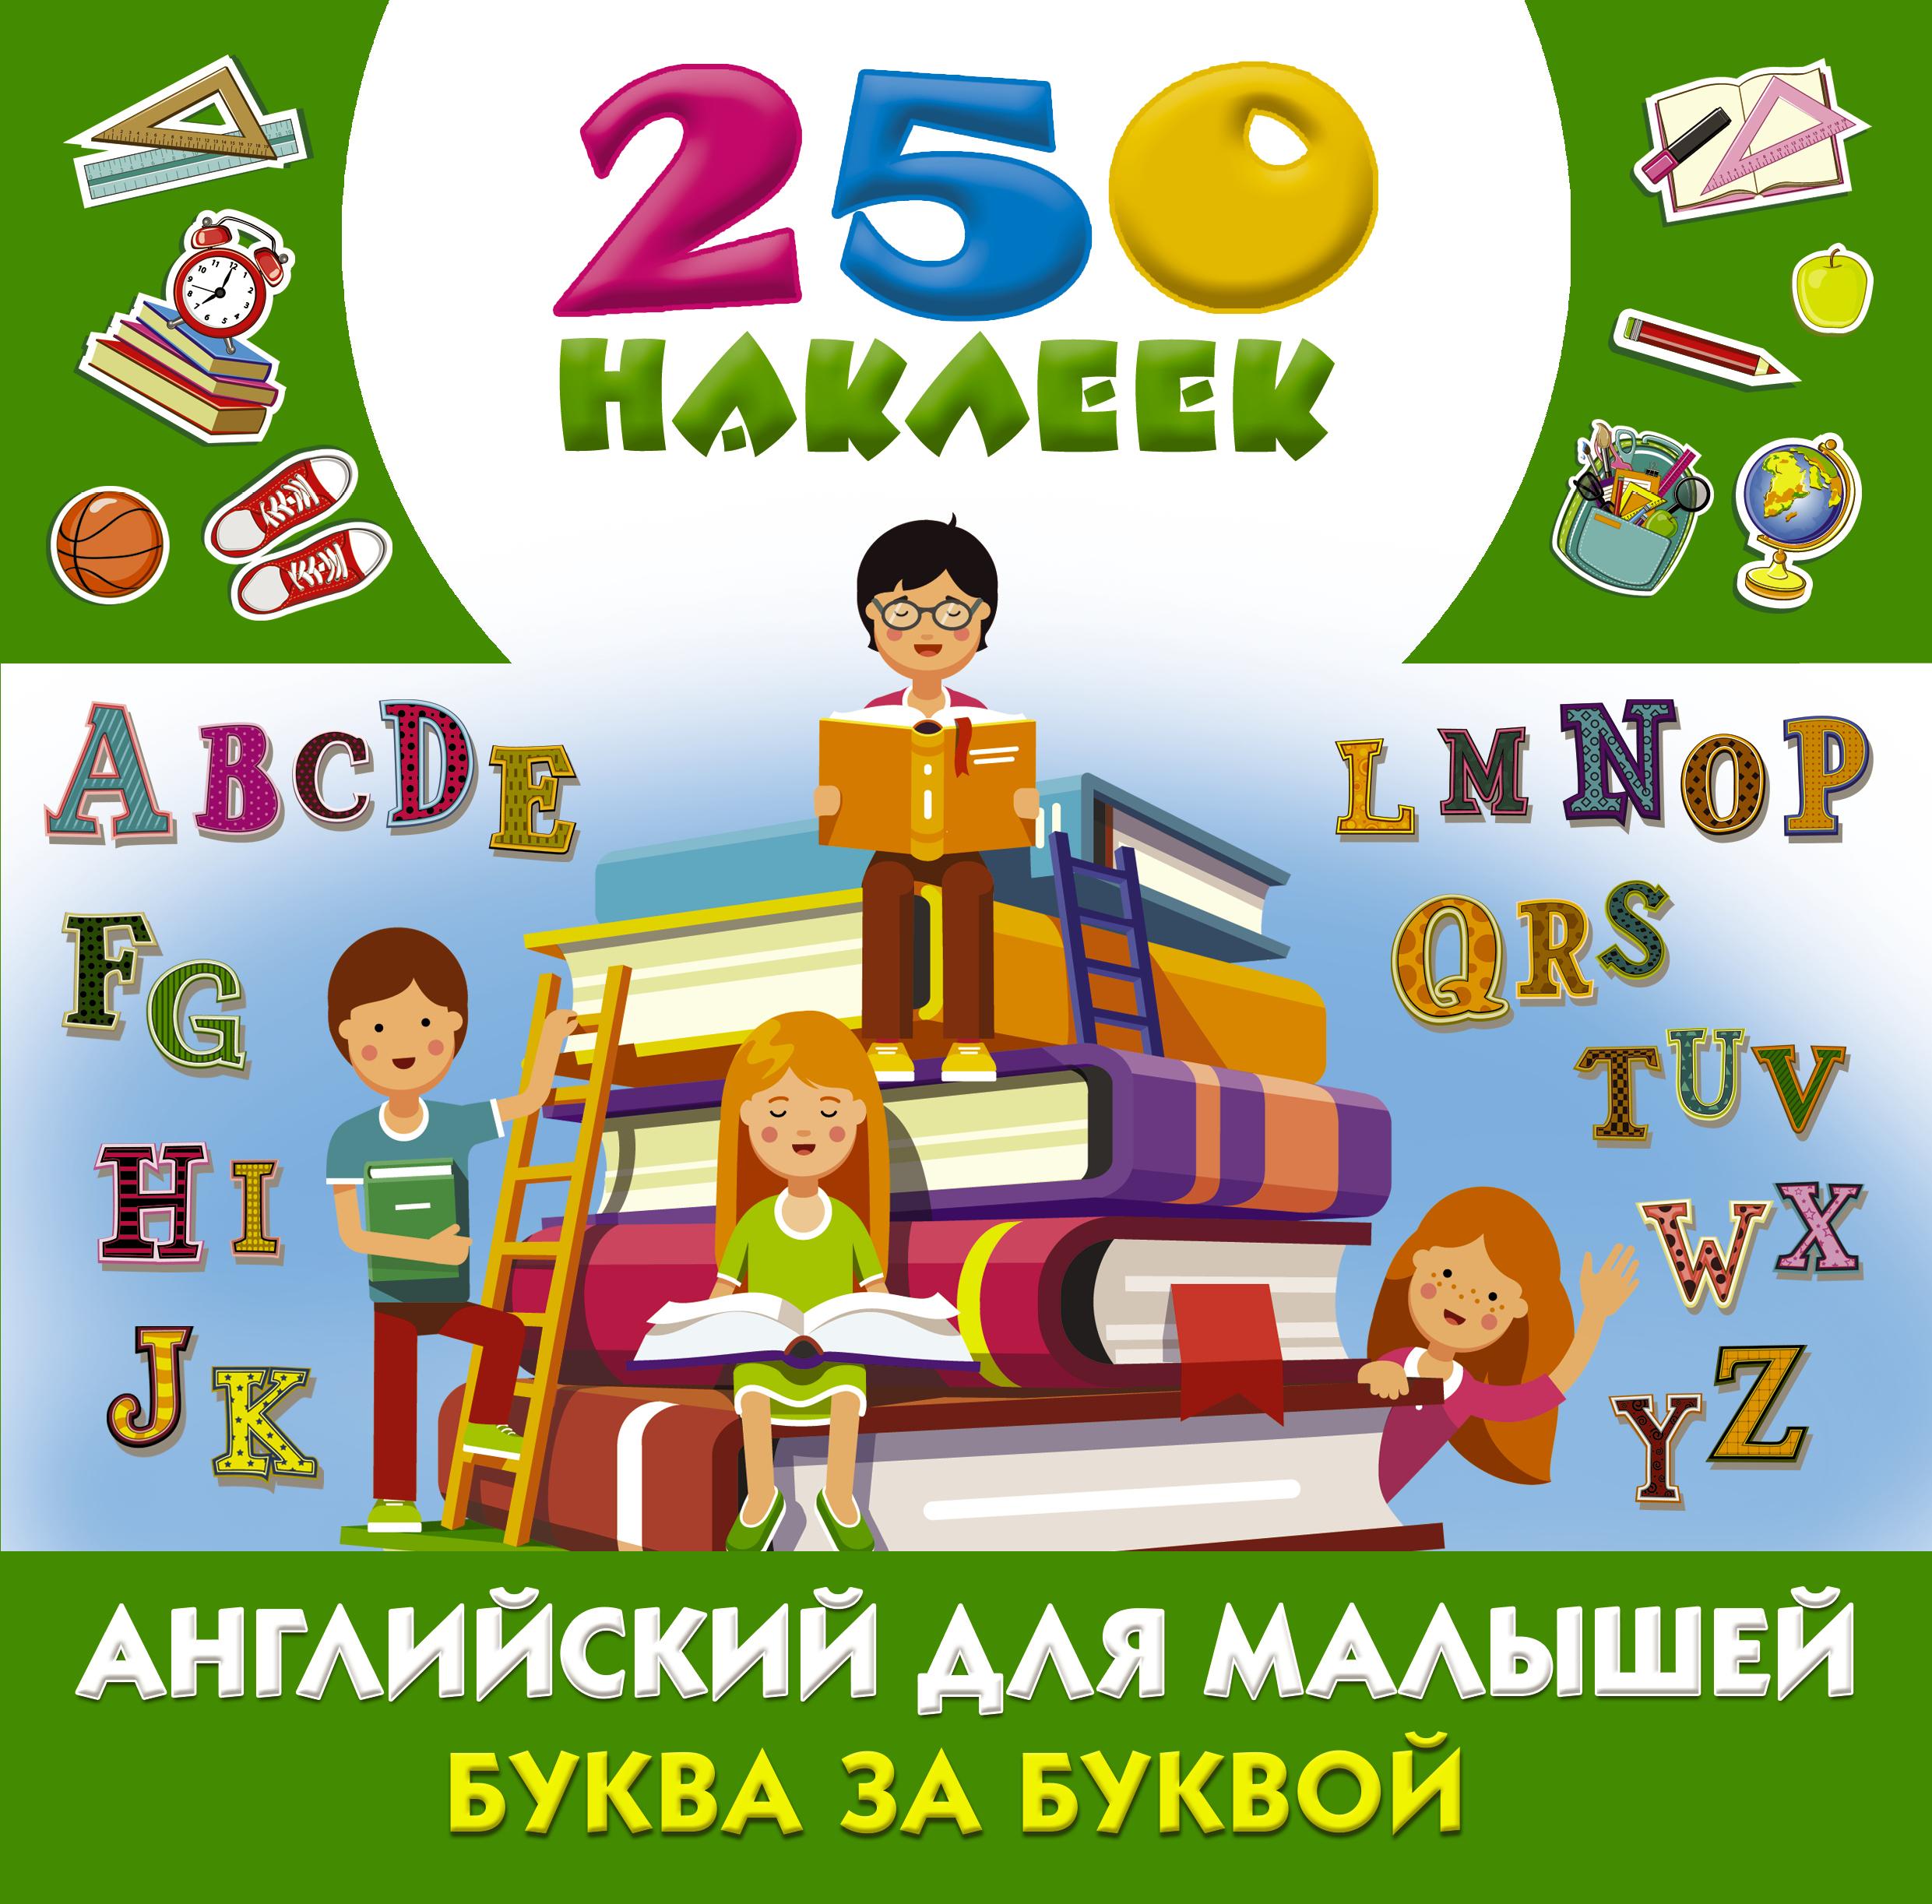 Глотова В.Ю. Английский для малышей: буква за буквой английский за 42 дня